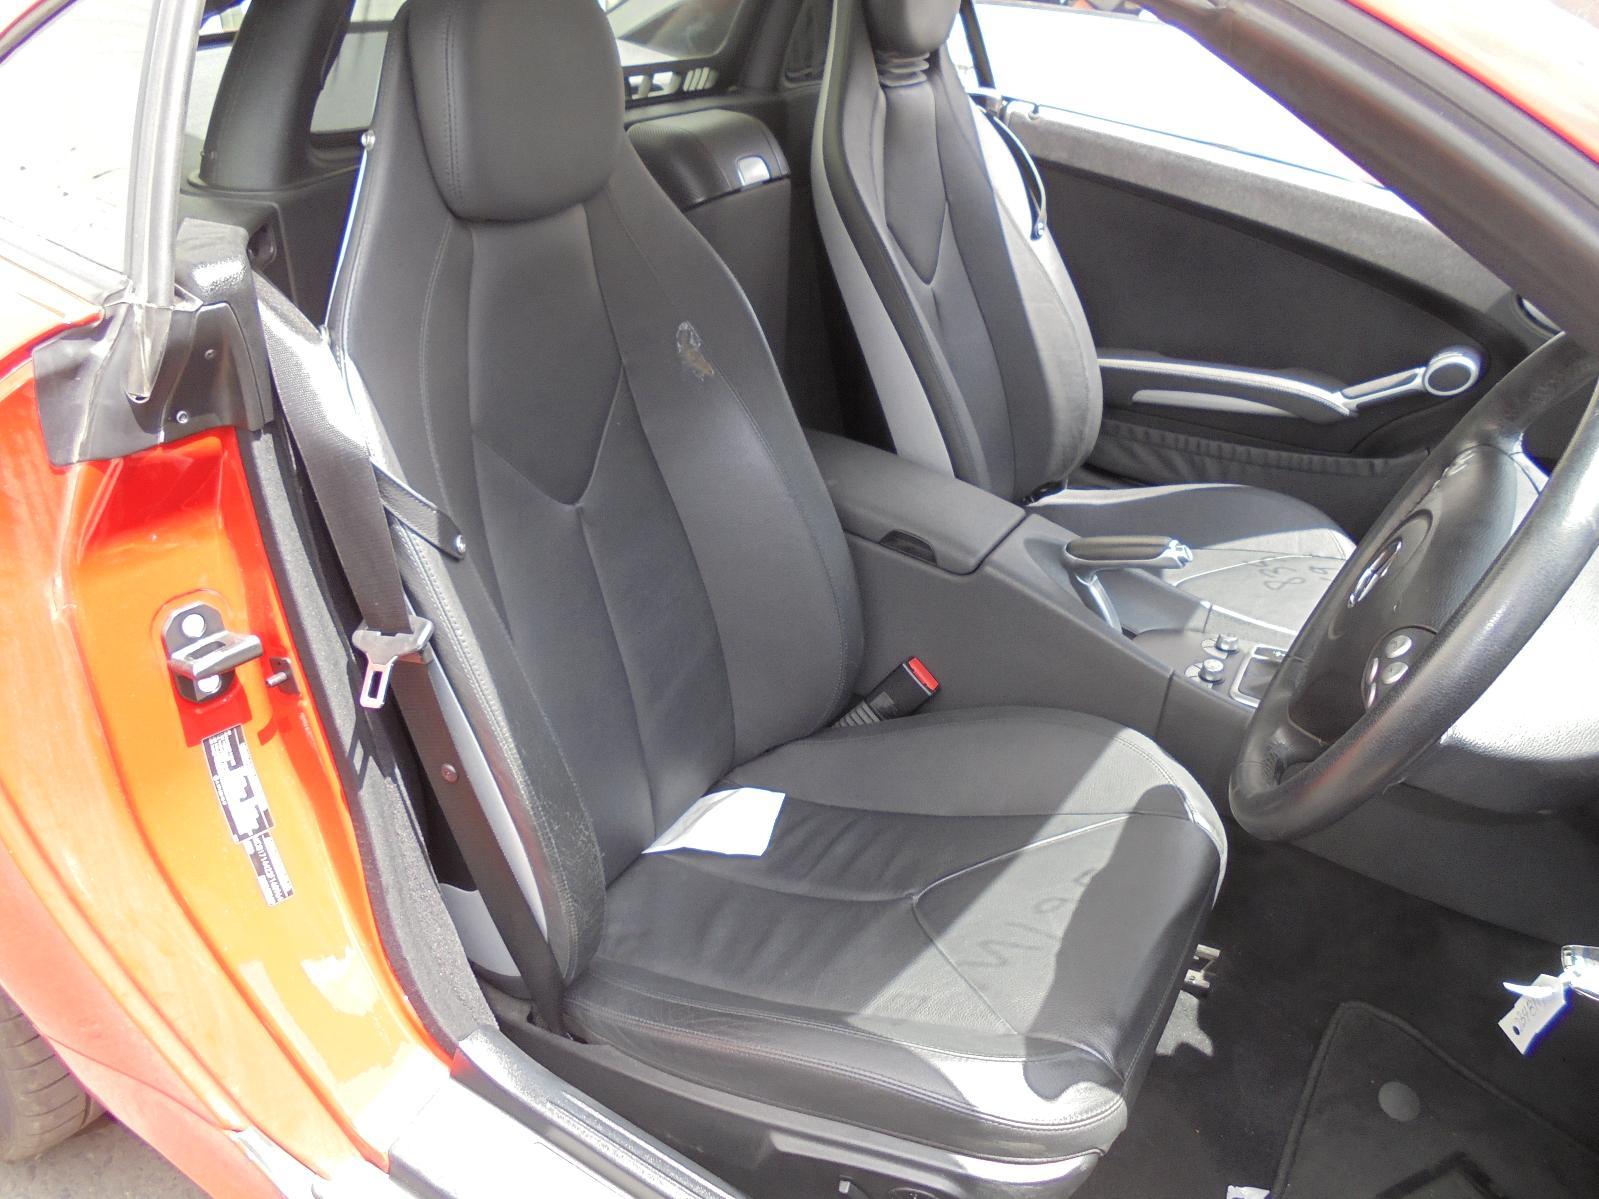 MERCEDES-SLK-W171-PAIR-OF-FRONT-SEATS-09-04-06-11